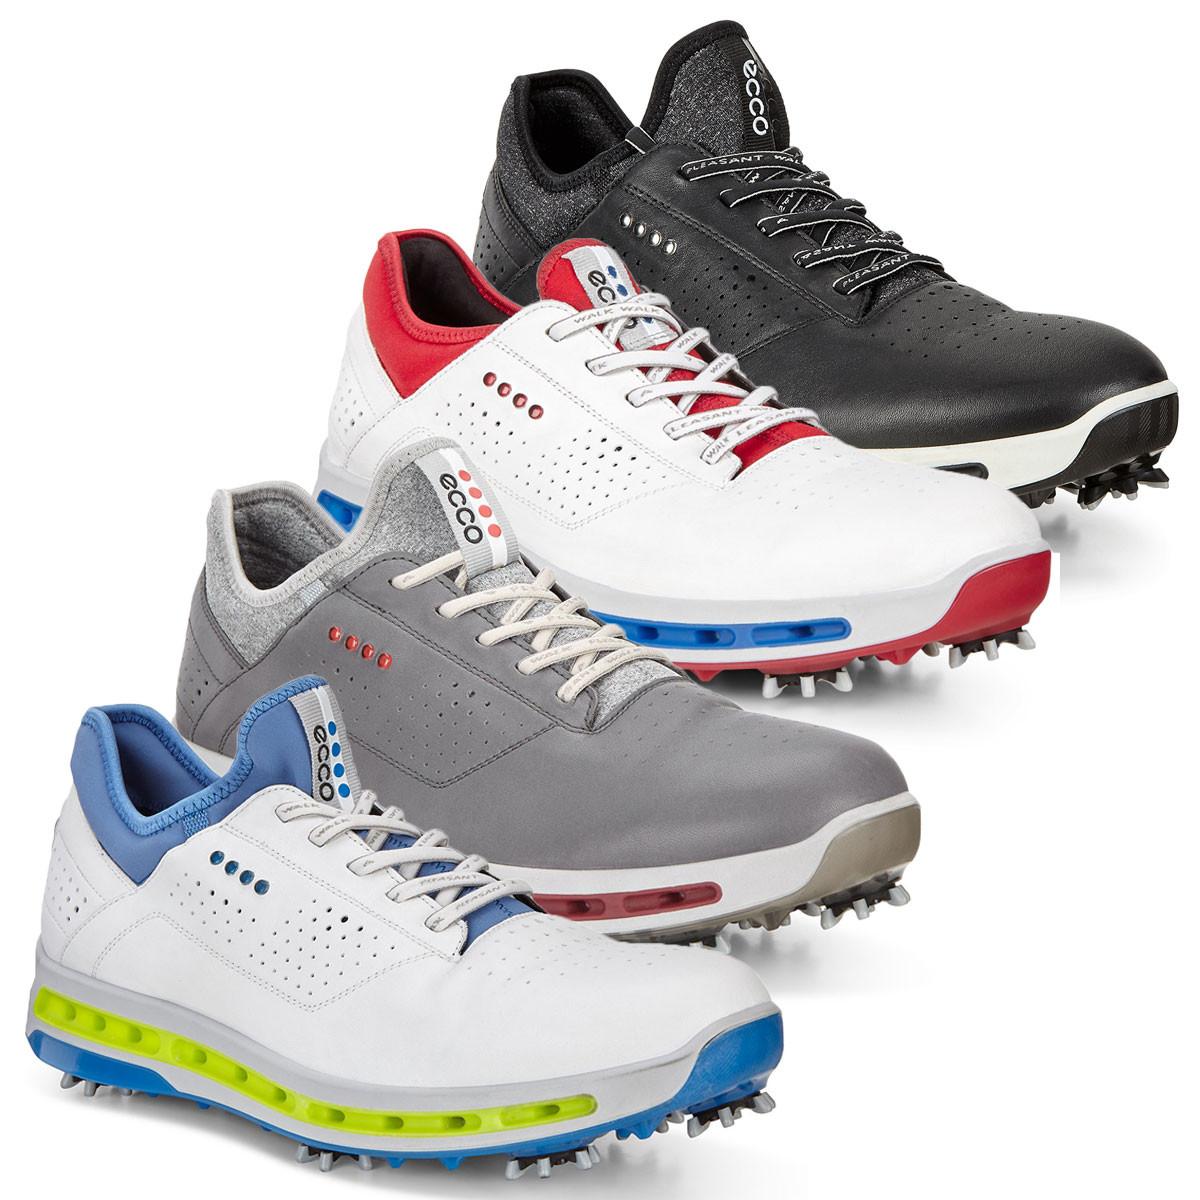 30afc6fdc6 Ecco Mens Waterproof Cool GoreTex Golf Shoes